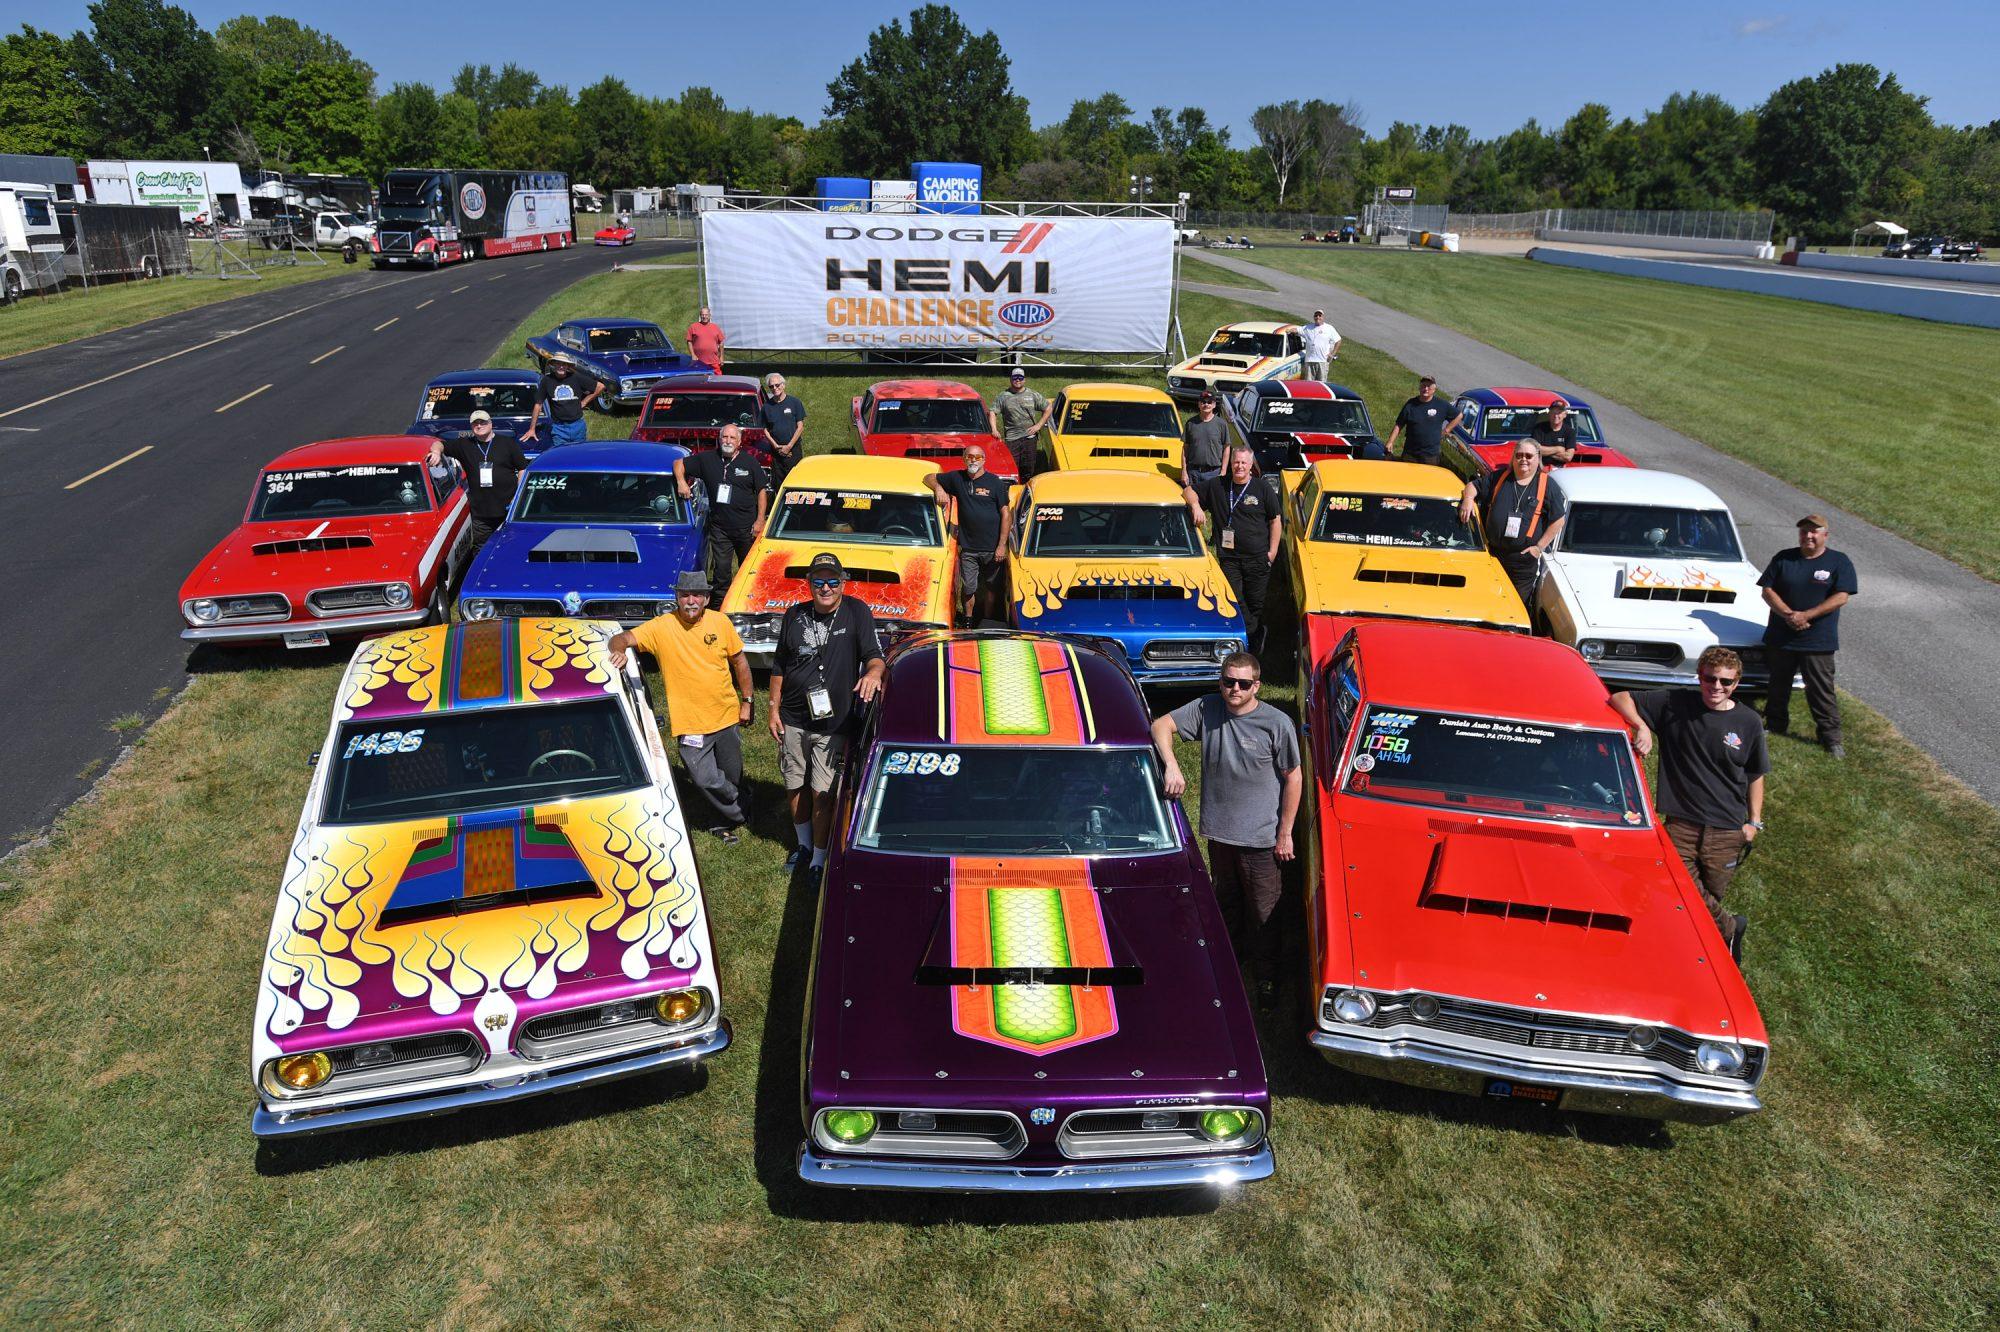 HEMI Challenge cars